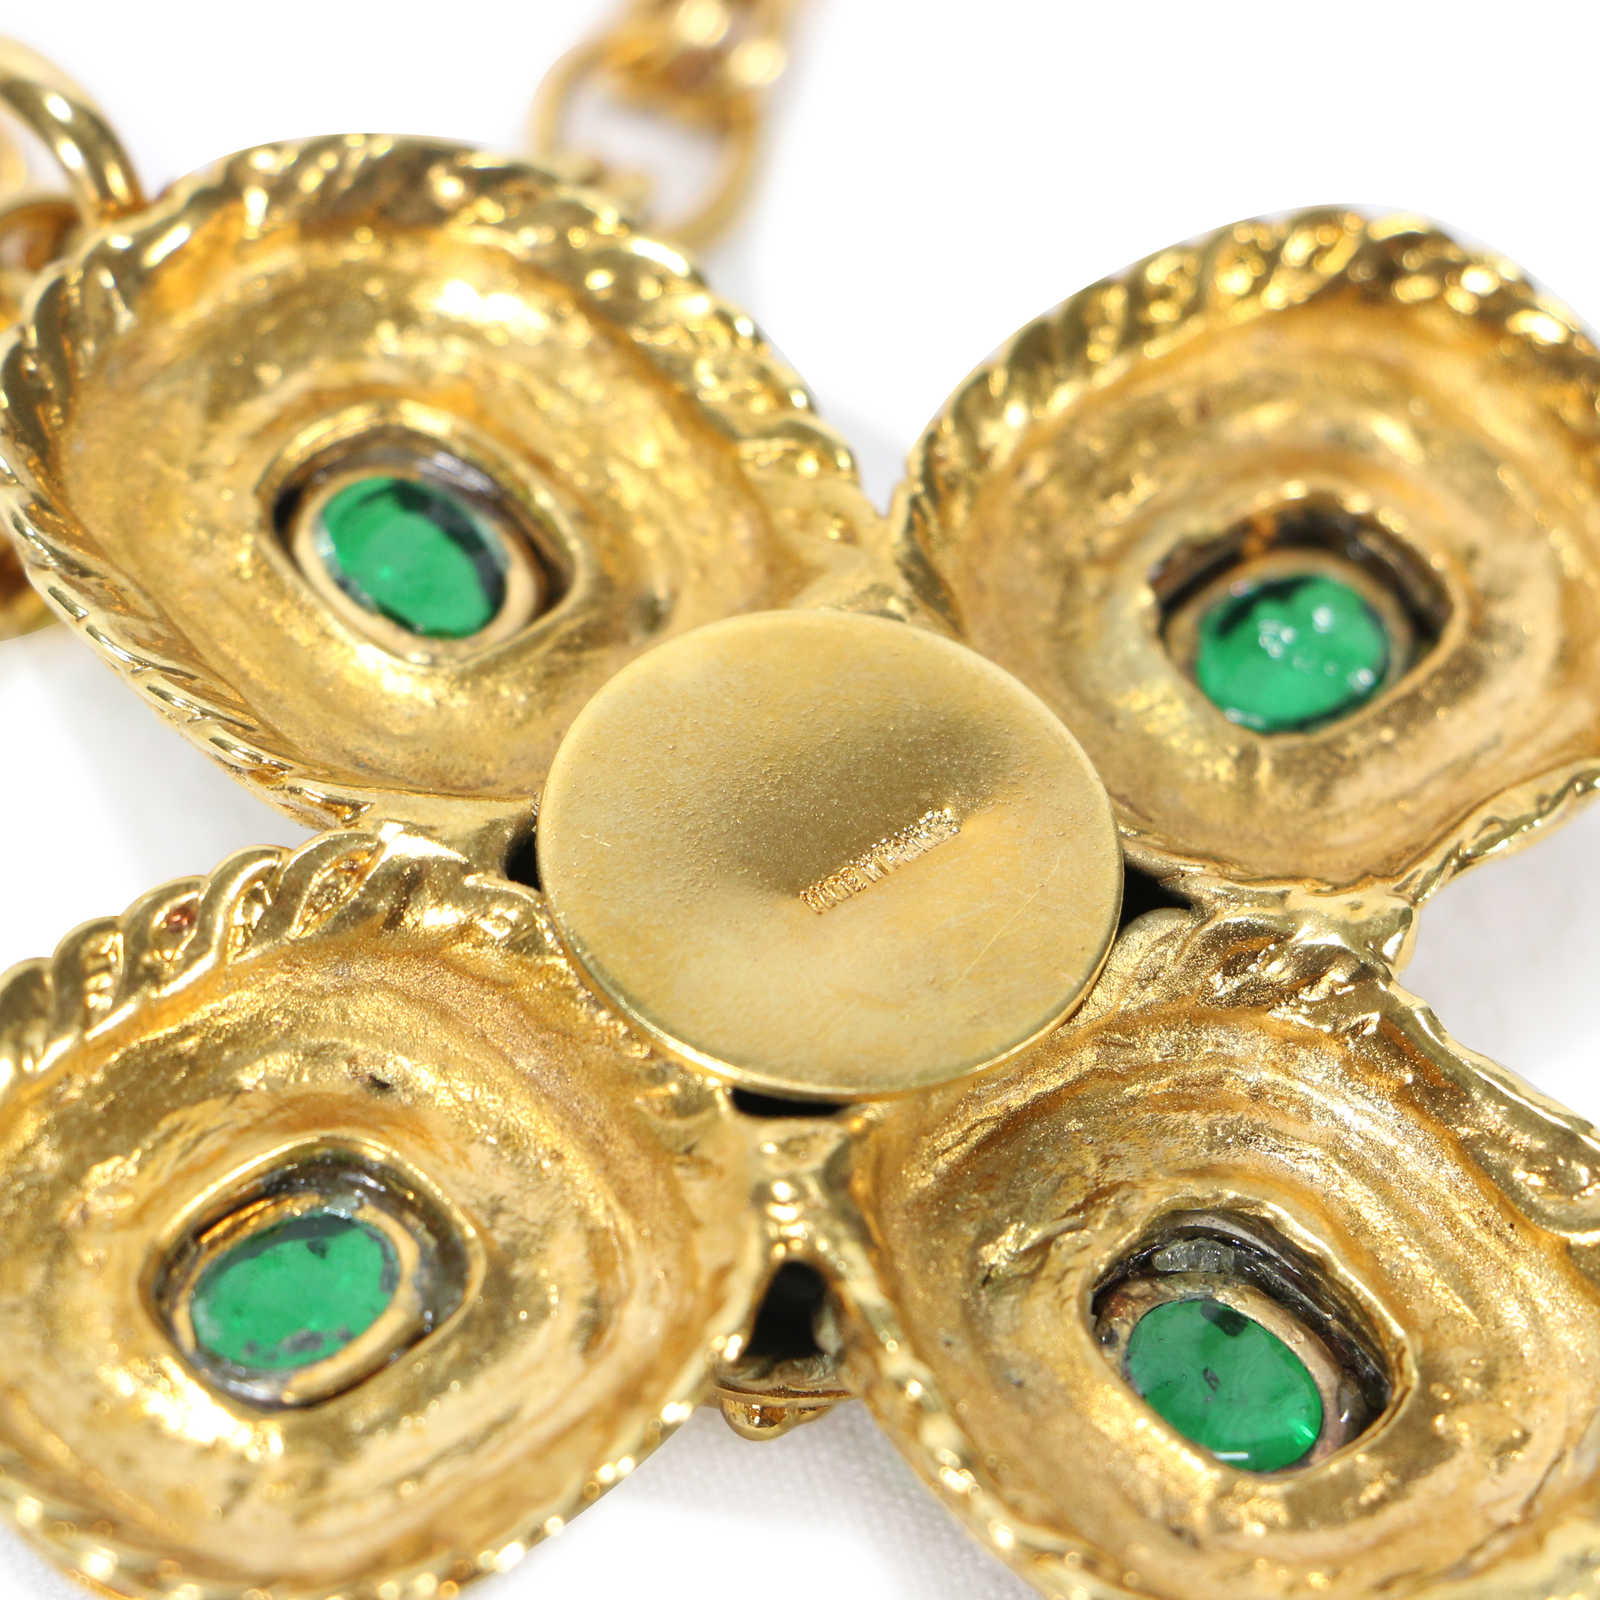 Authentic Vintage Chanel Byzantine Large Cross Necklace (TFC-203